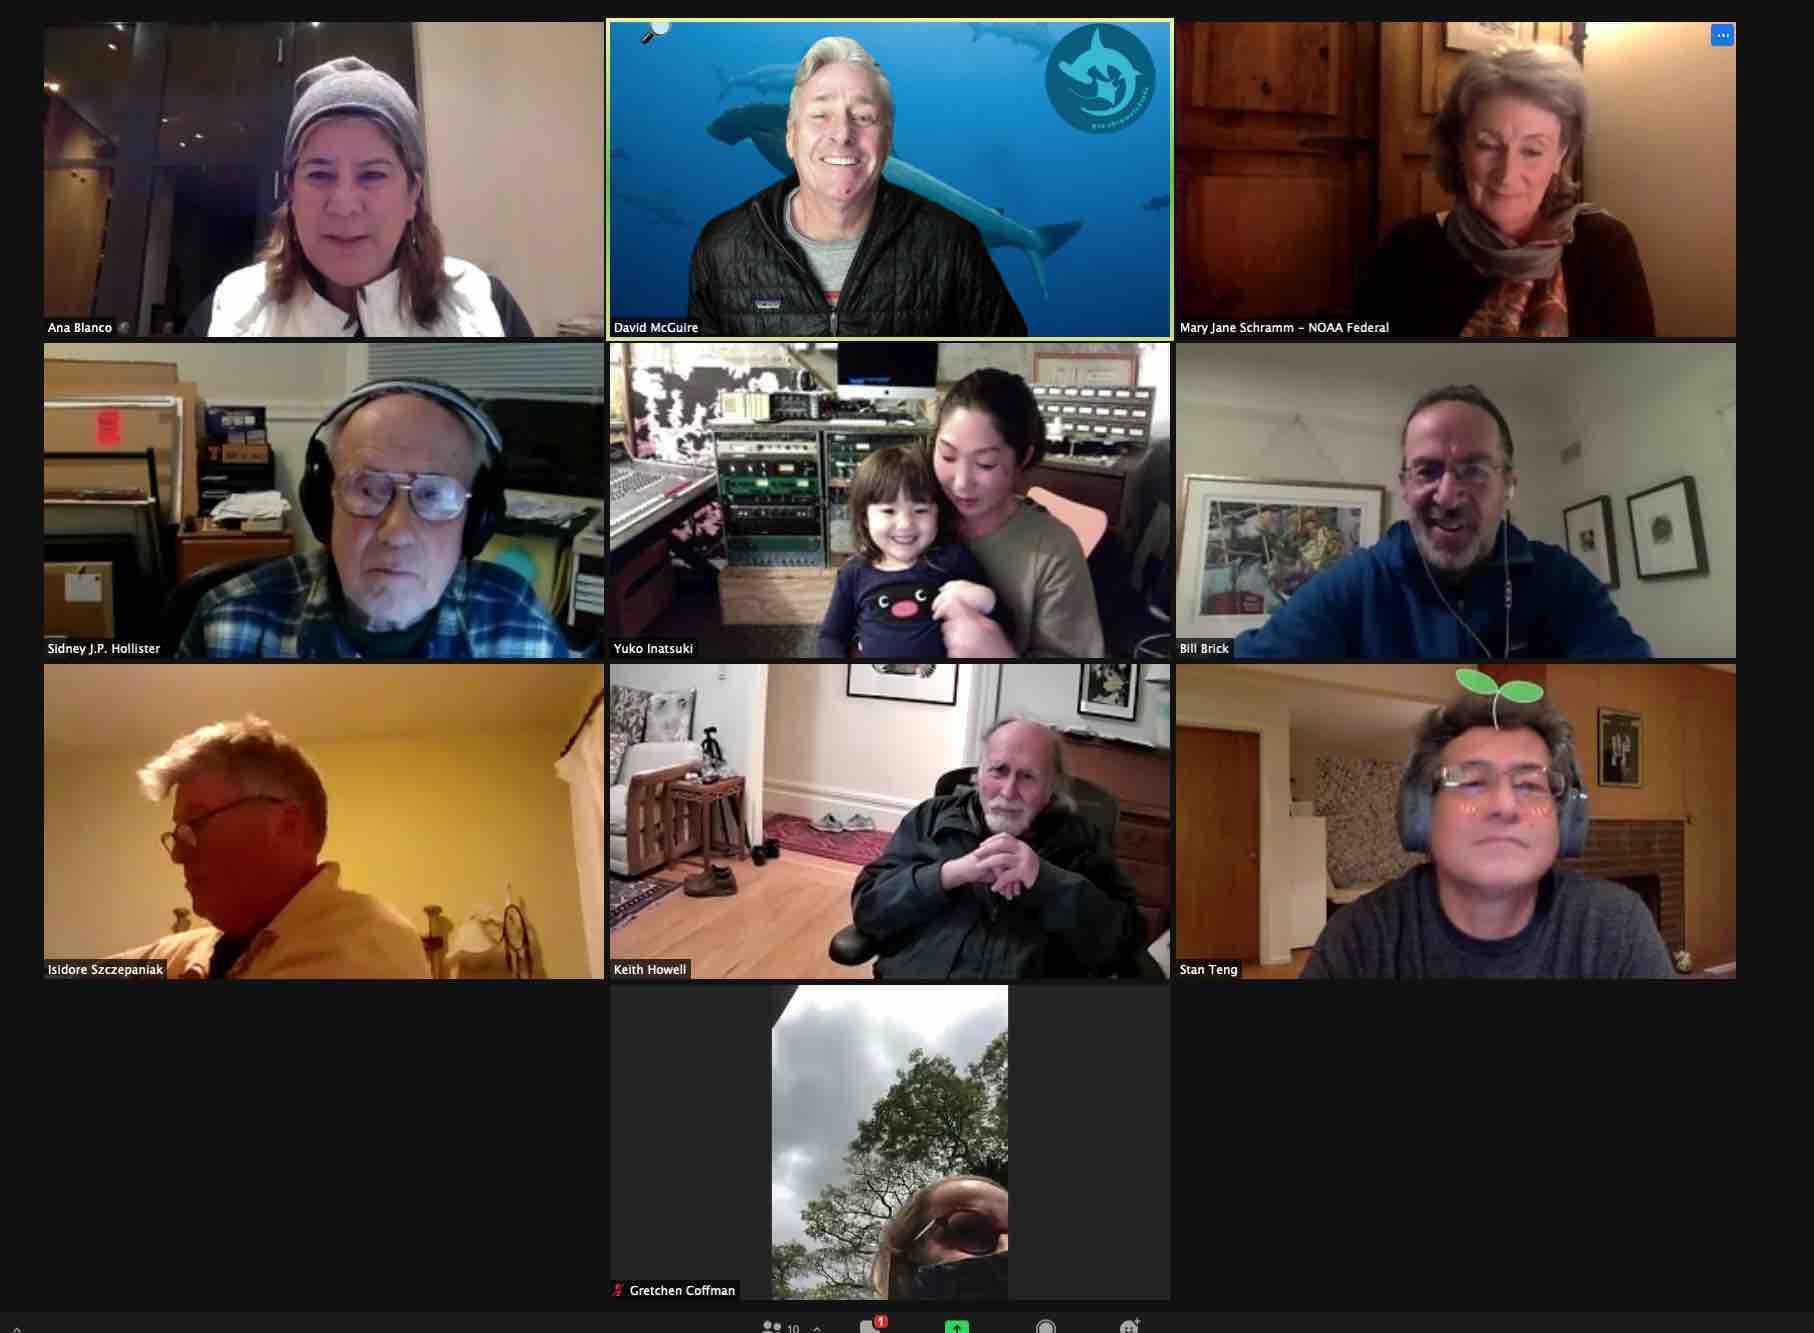 IOFF Screening Committee small